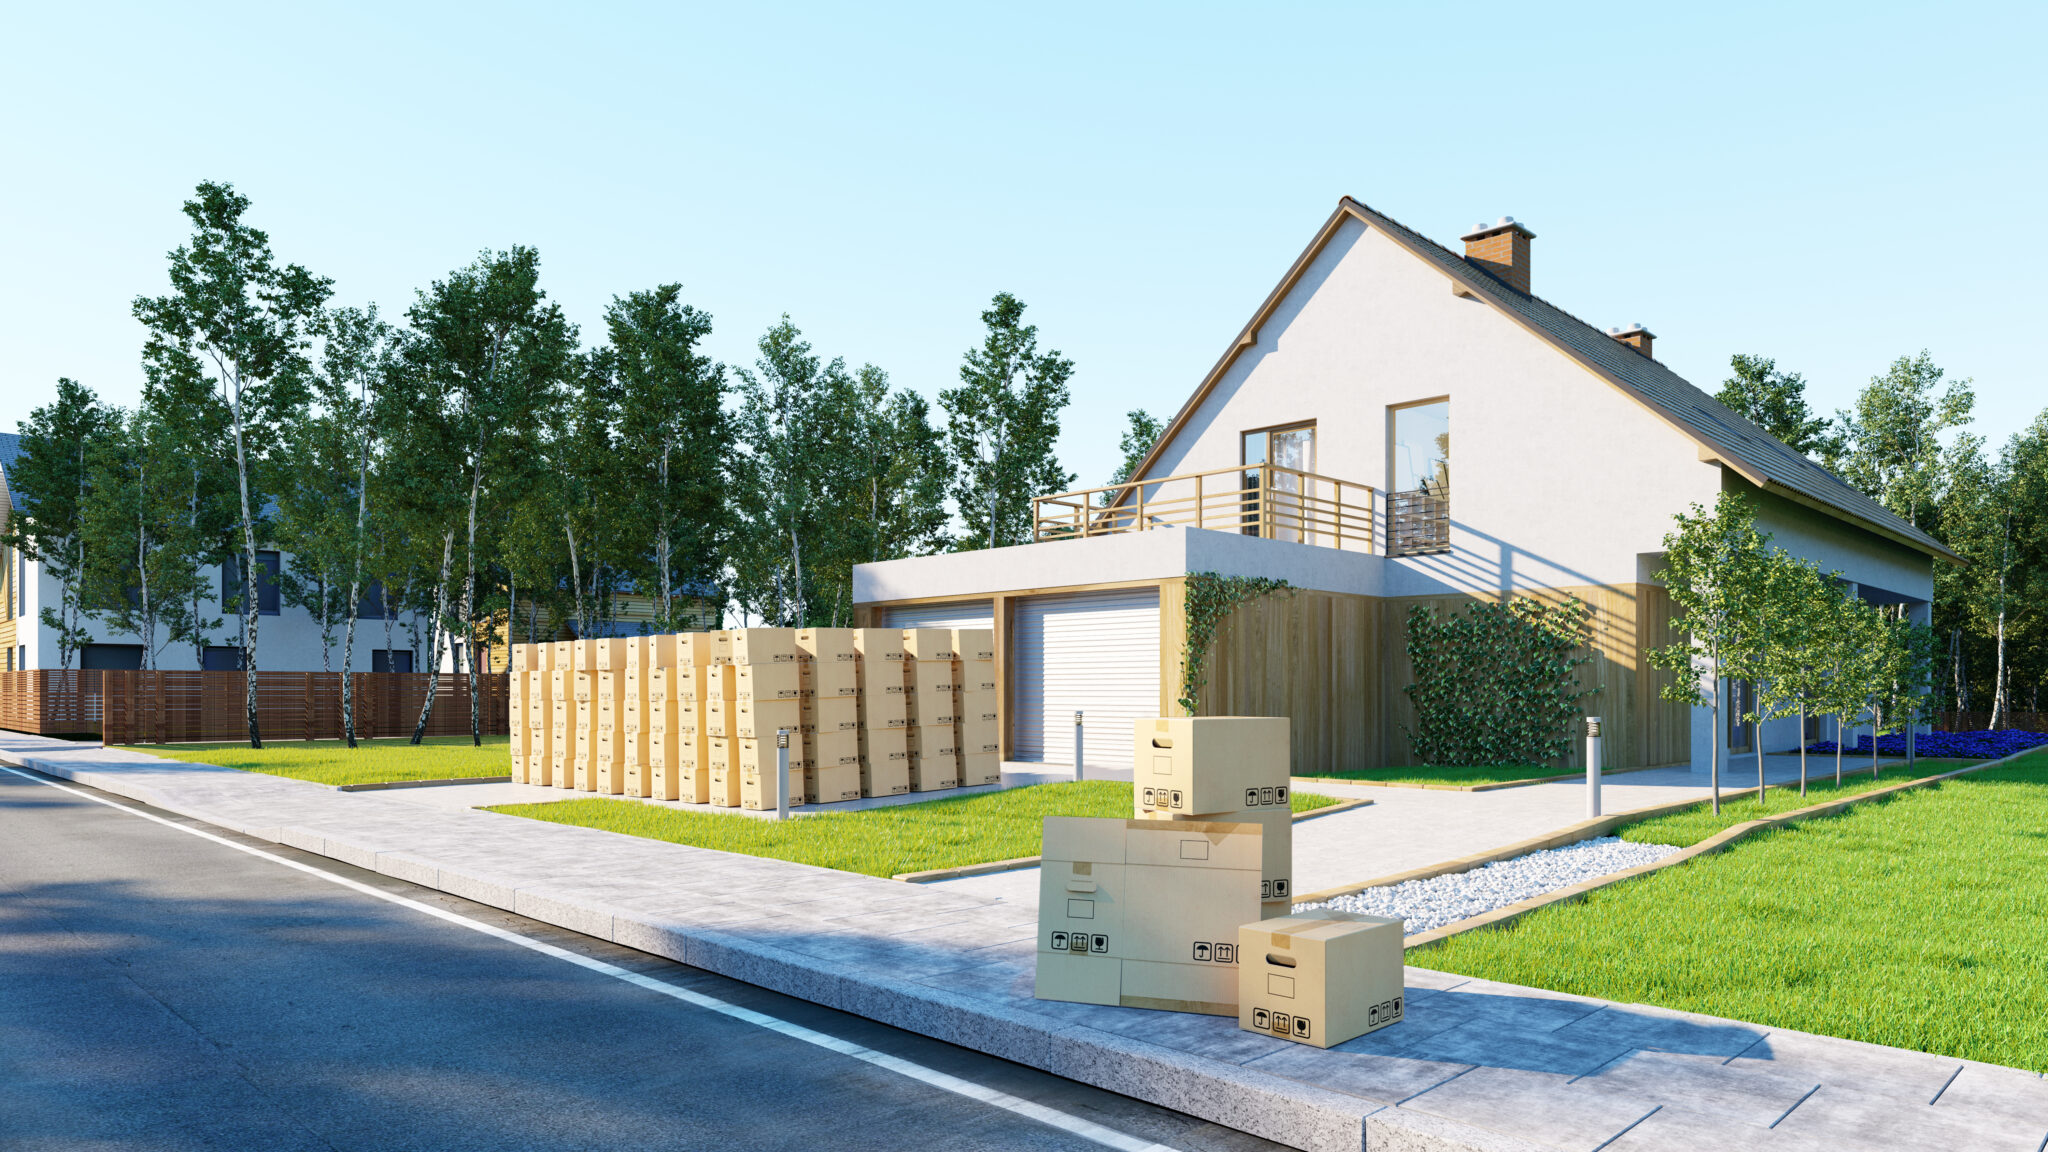 Hausratversicherung bei Umzug ins neue Eigenheim mit vielen Umzugskartons